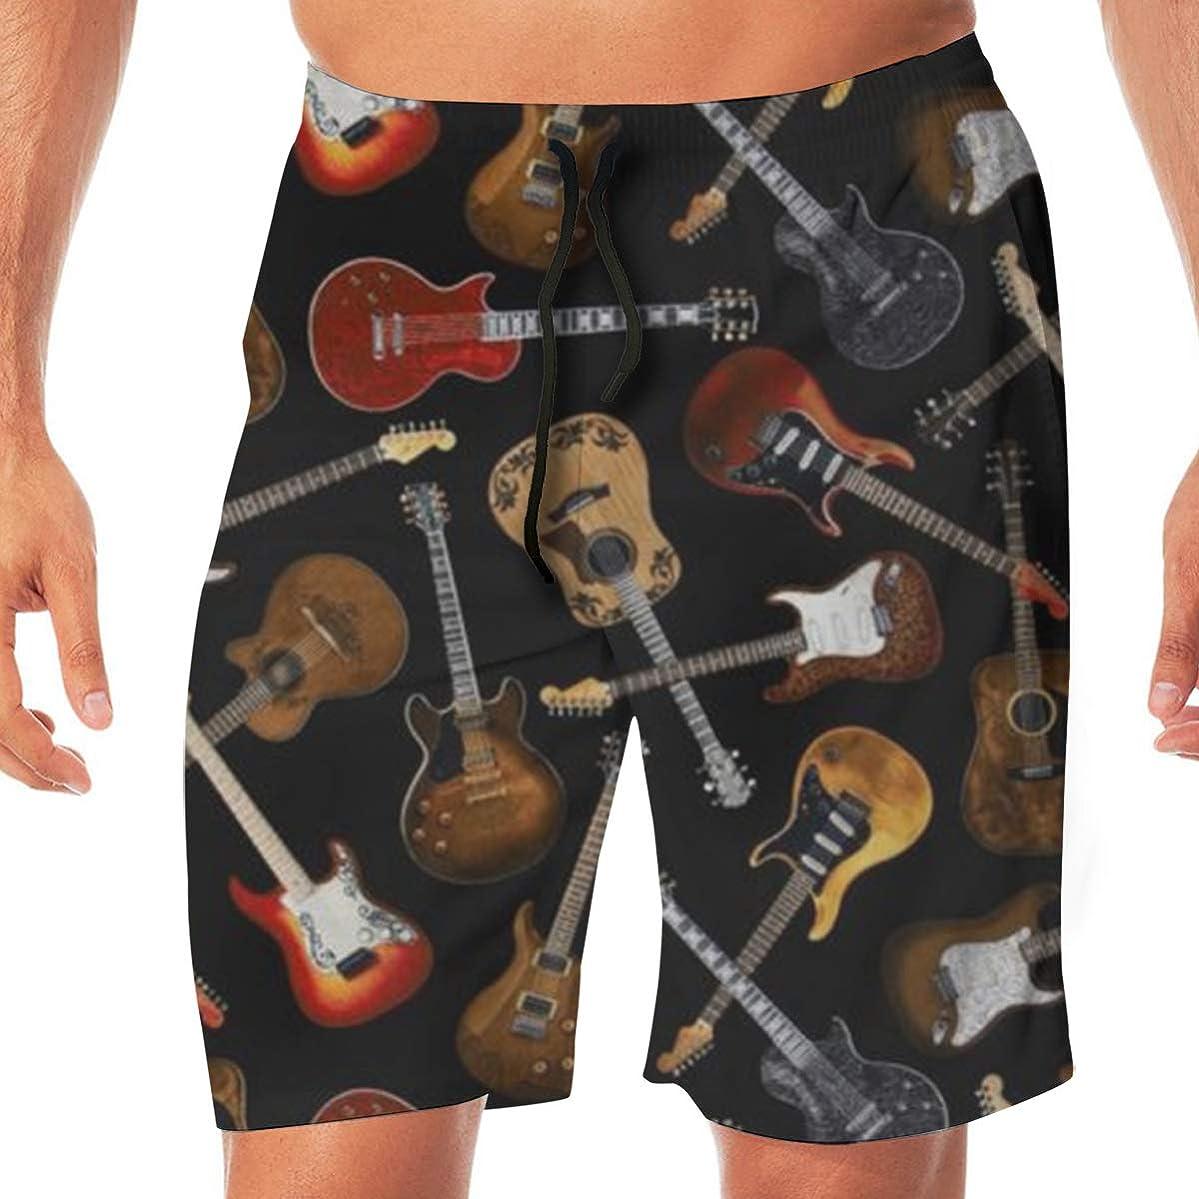 MaoYTUI Guitars Black Mens Swim Trunks Boys Quick Dry Bathing Suits Drawstring Waist Beach Broad Shorts Swim Suit Beachwear with Mesh Lining